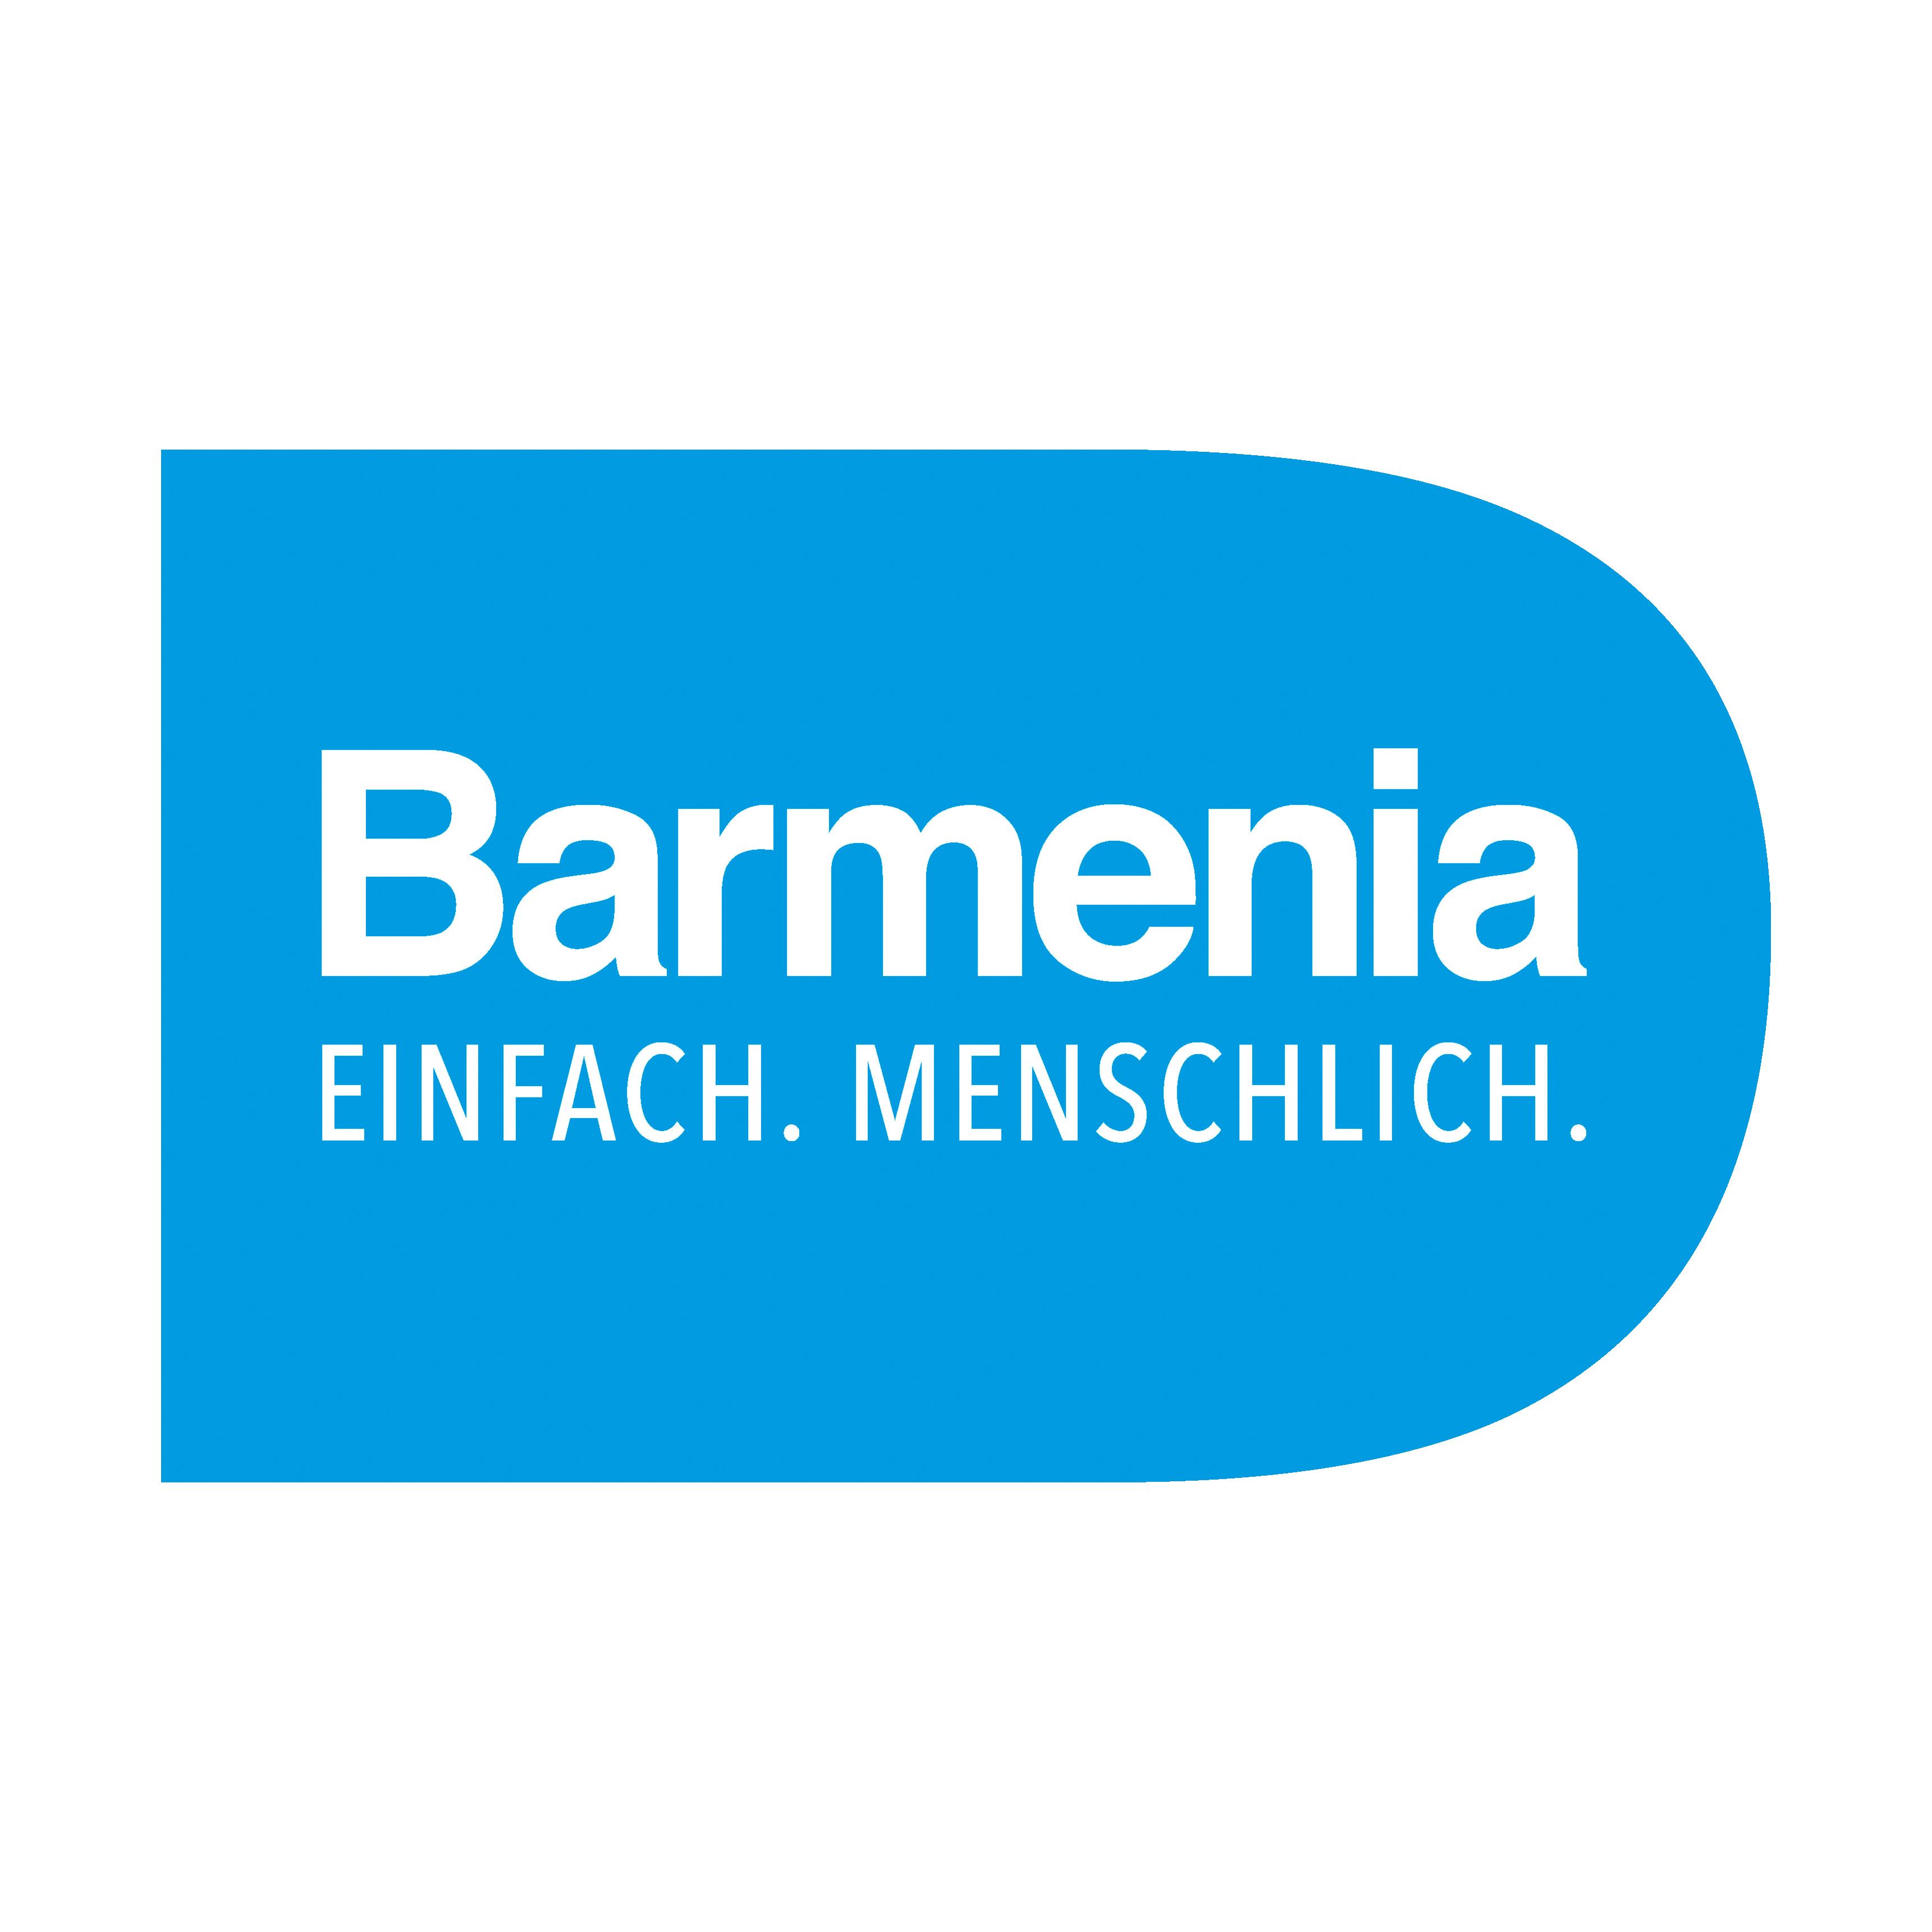 Partnerlogo Barmenia Krankenversicherung AG